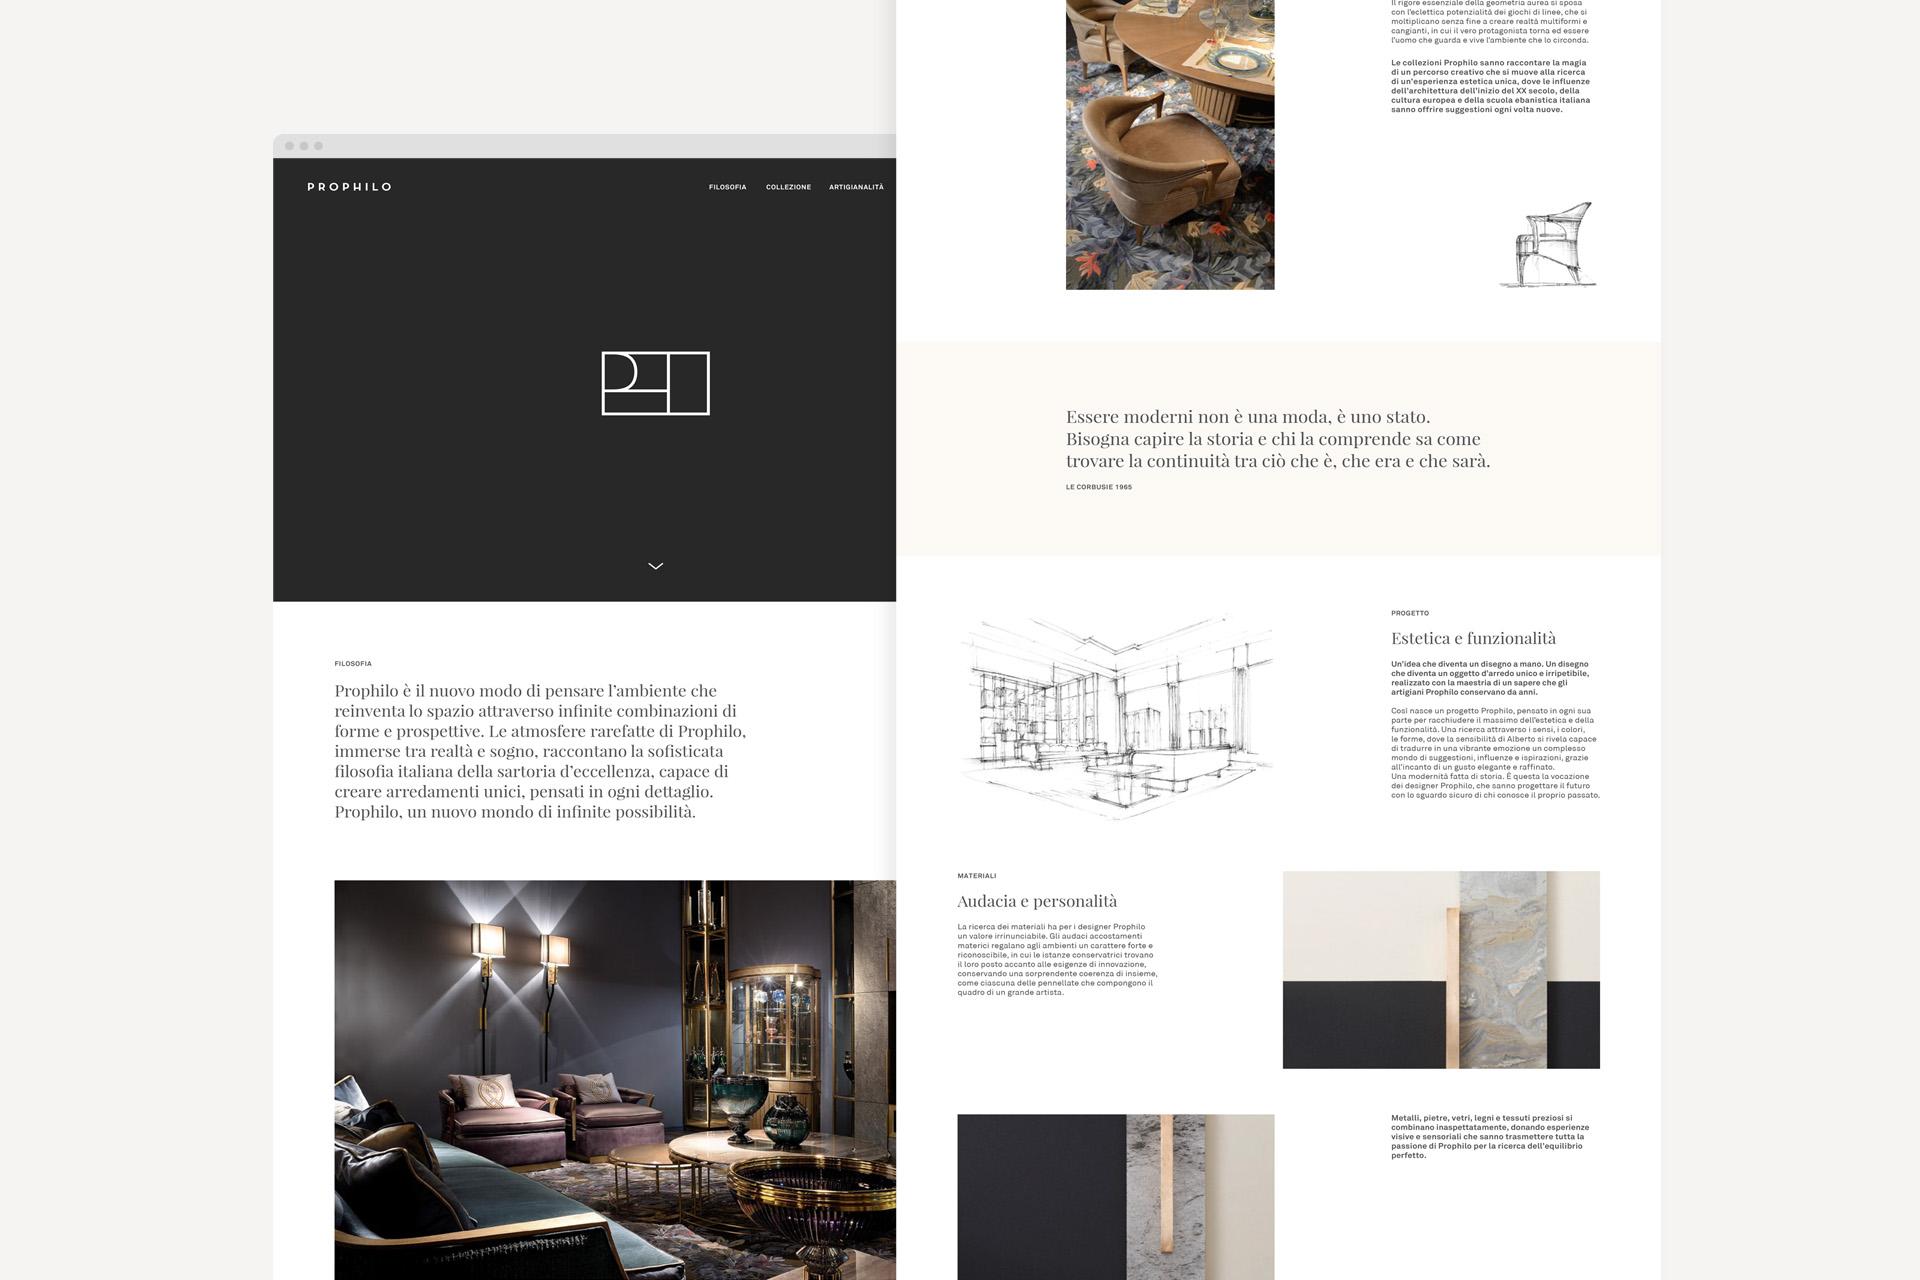 sito prophilo overview_web